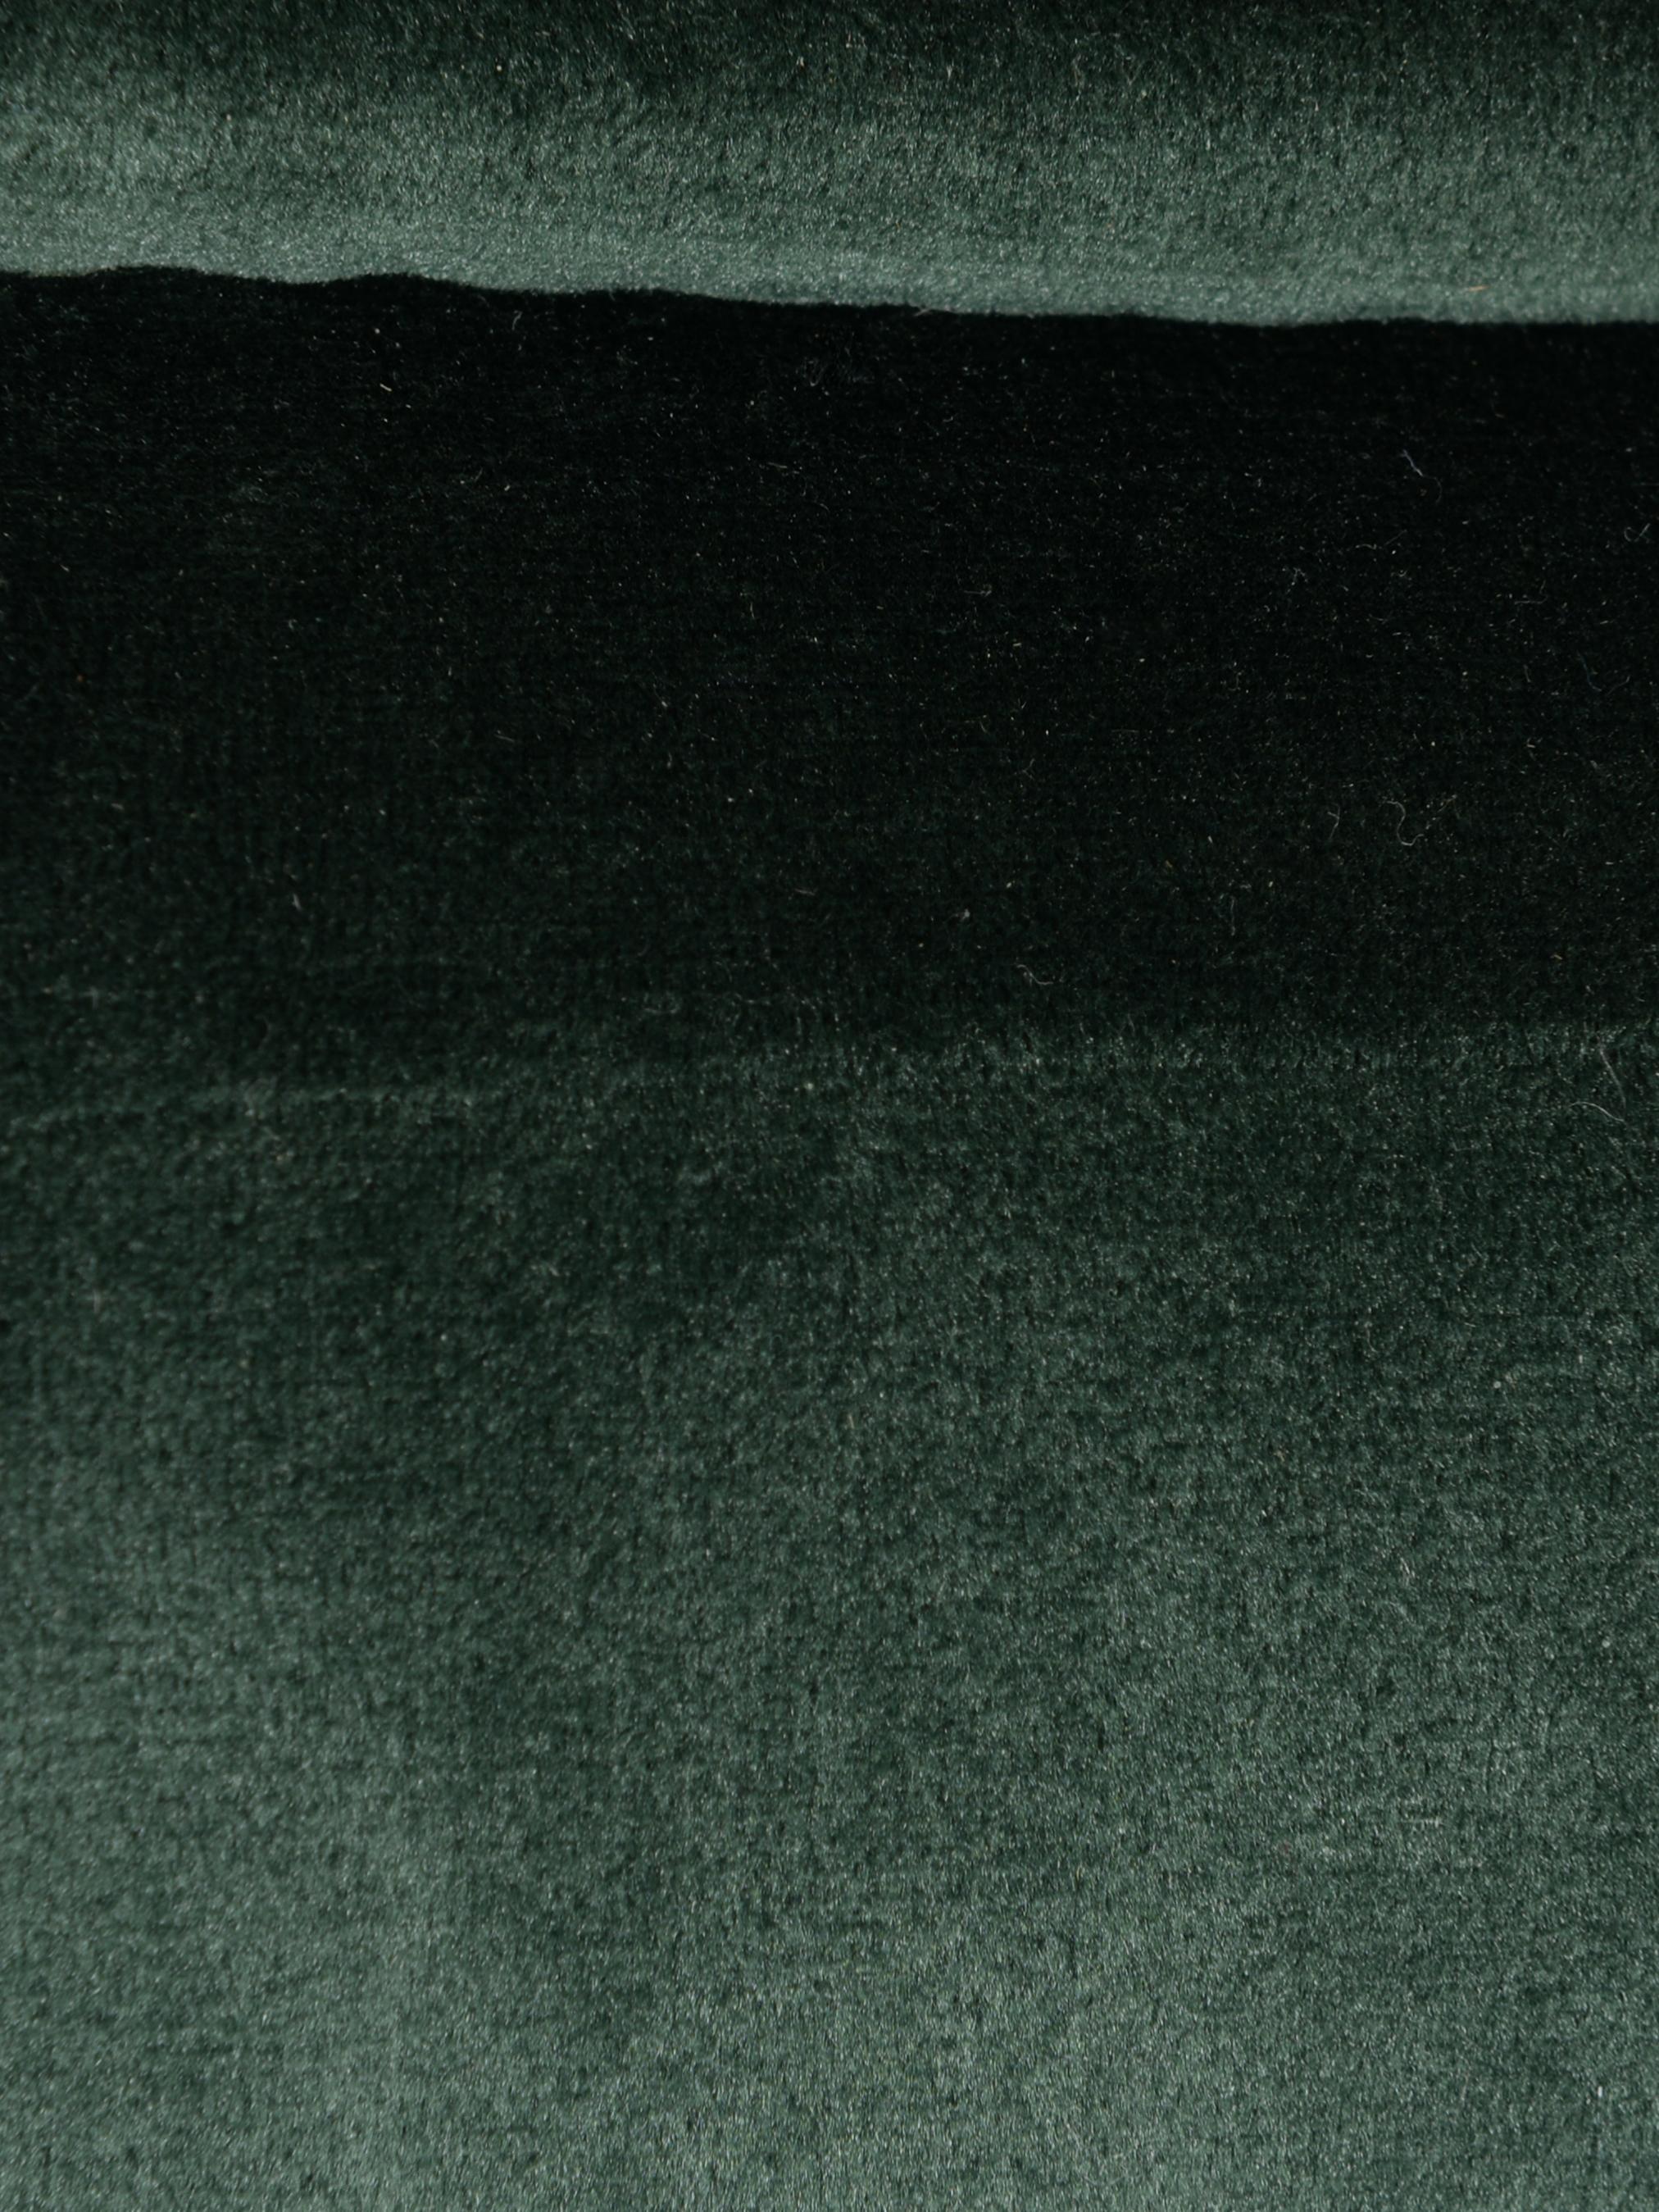 Fluwelen eetkamerbank Verona, Bekleding: polyesterfluweel, Groen, zwart, B 134 x D 55 cm